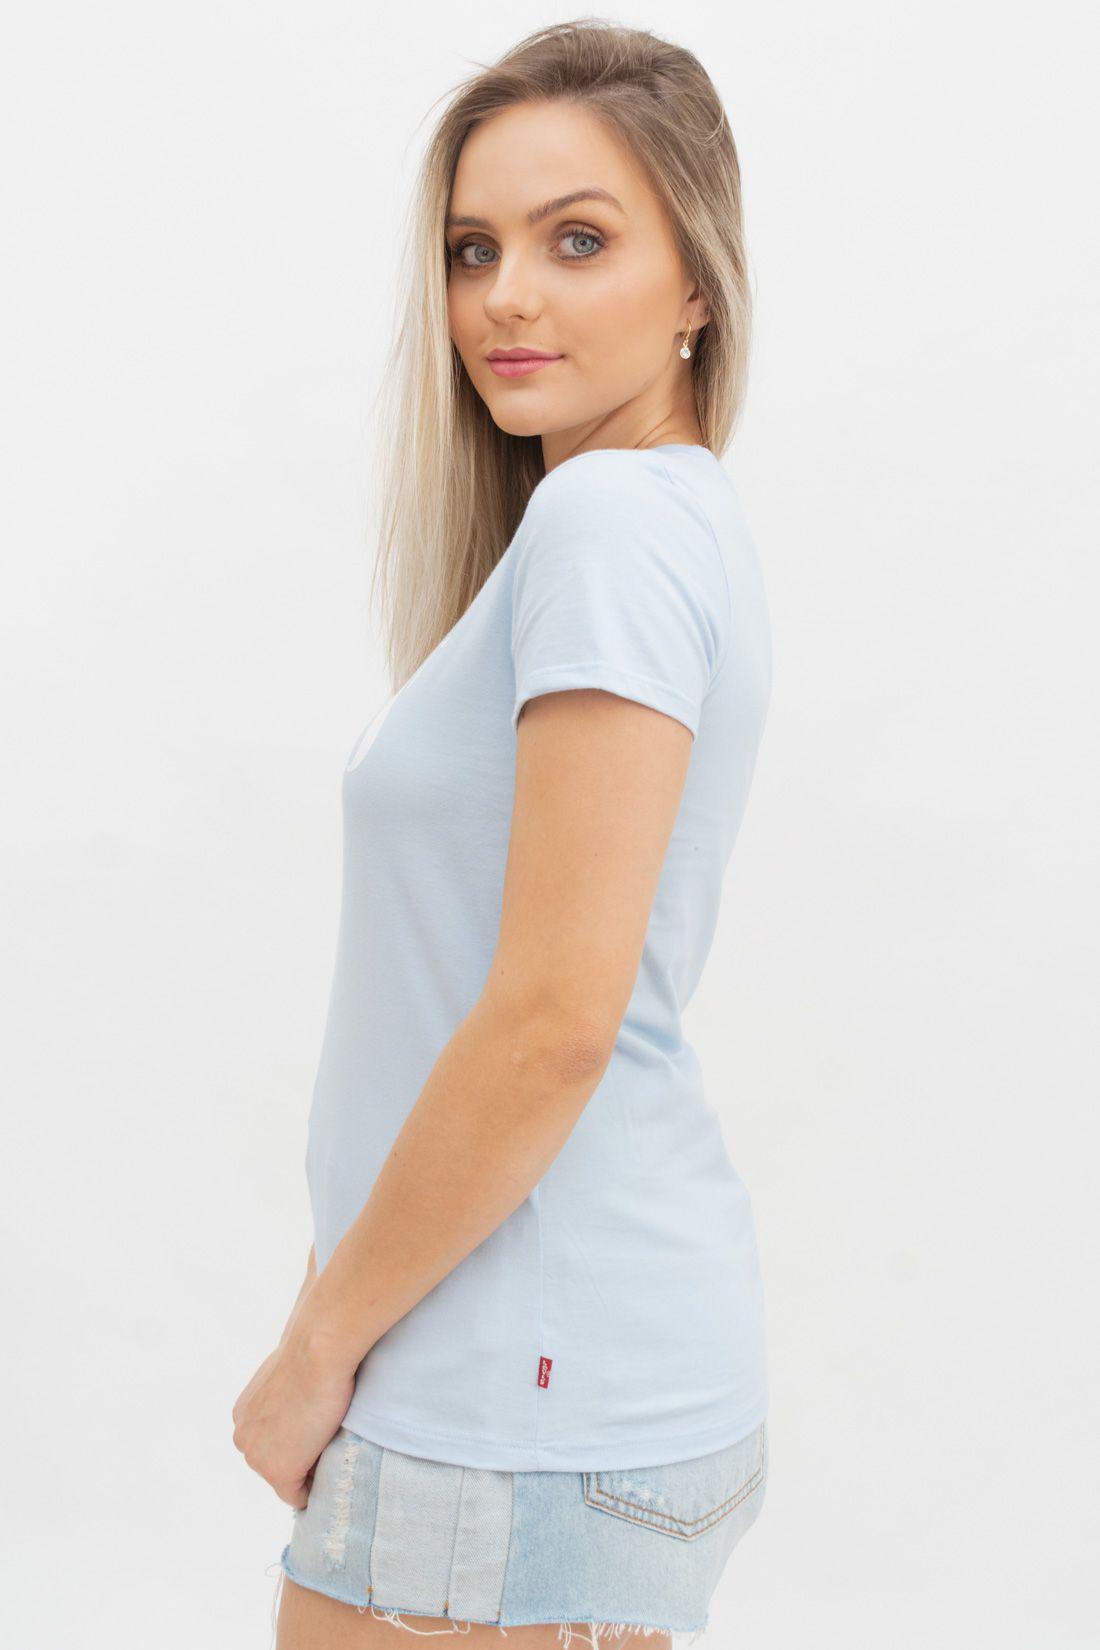 T Shirt Levis White